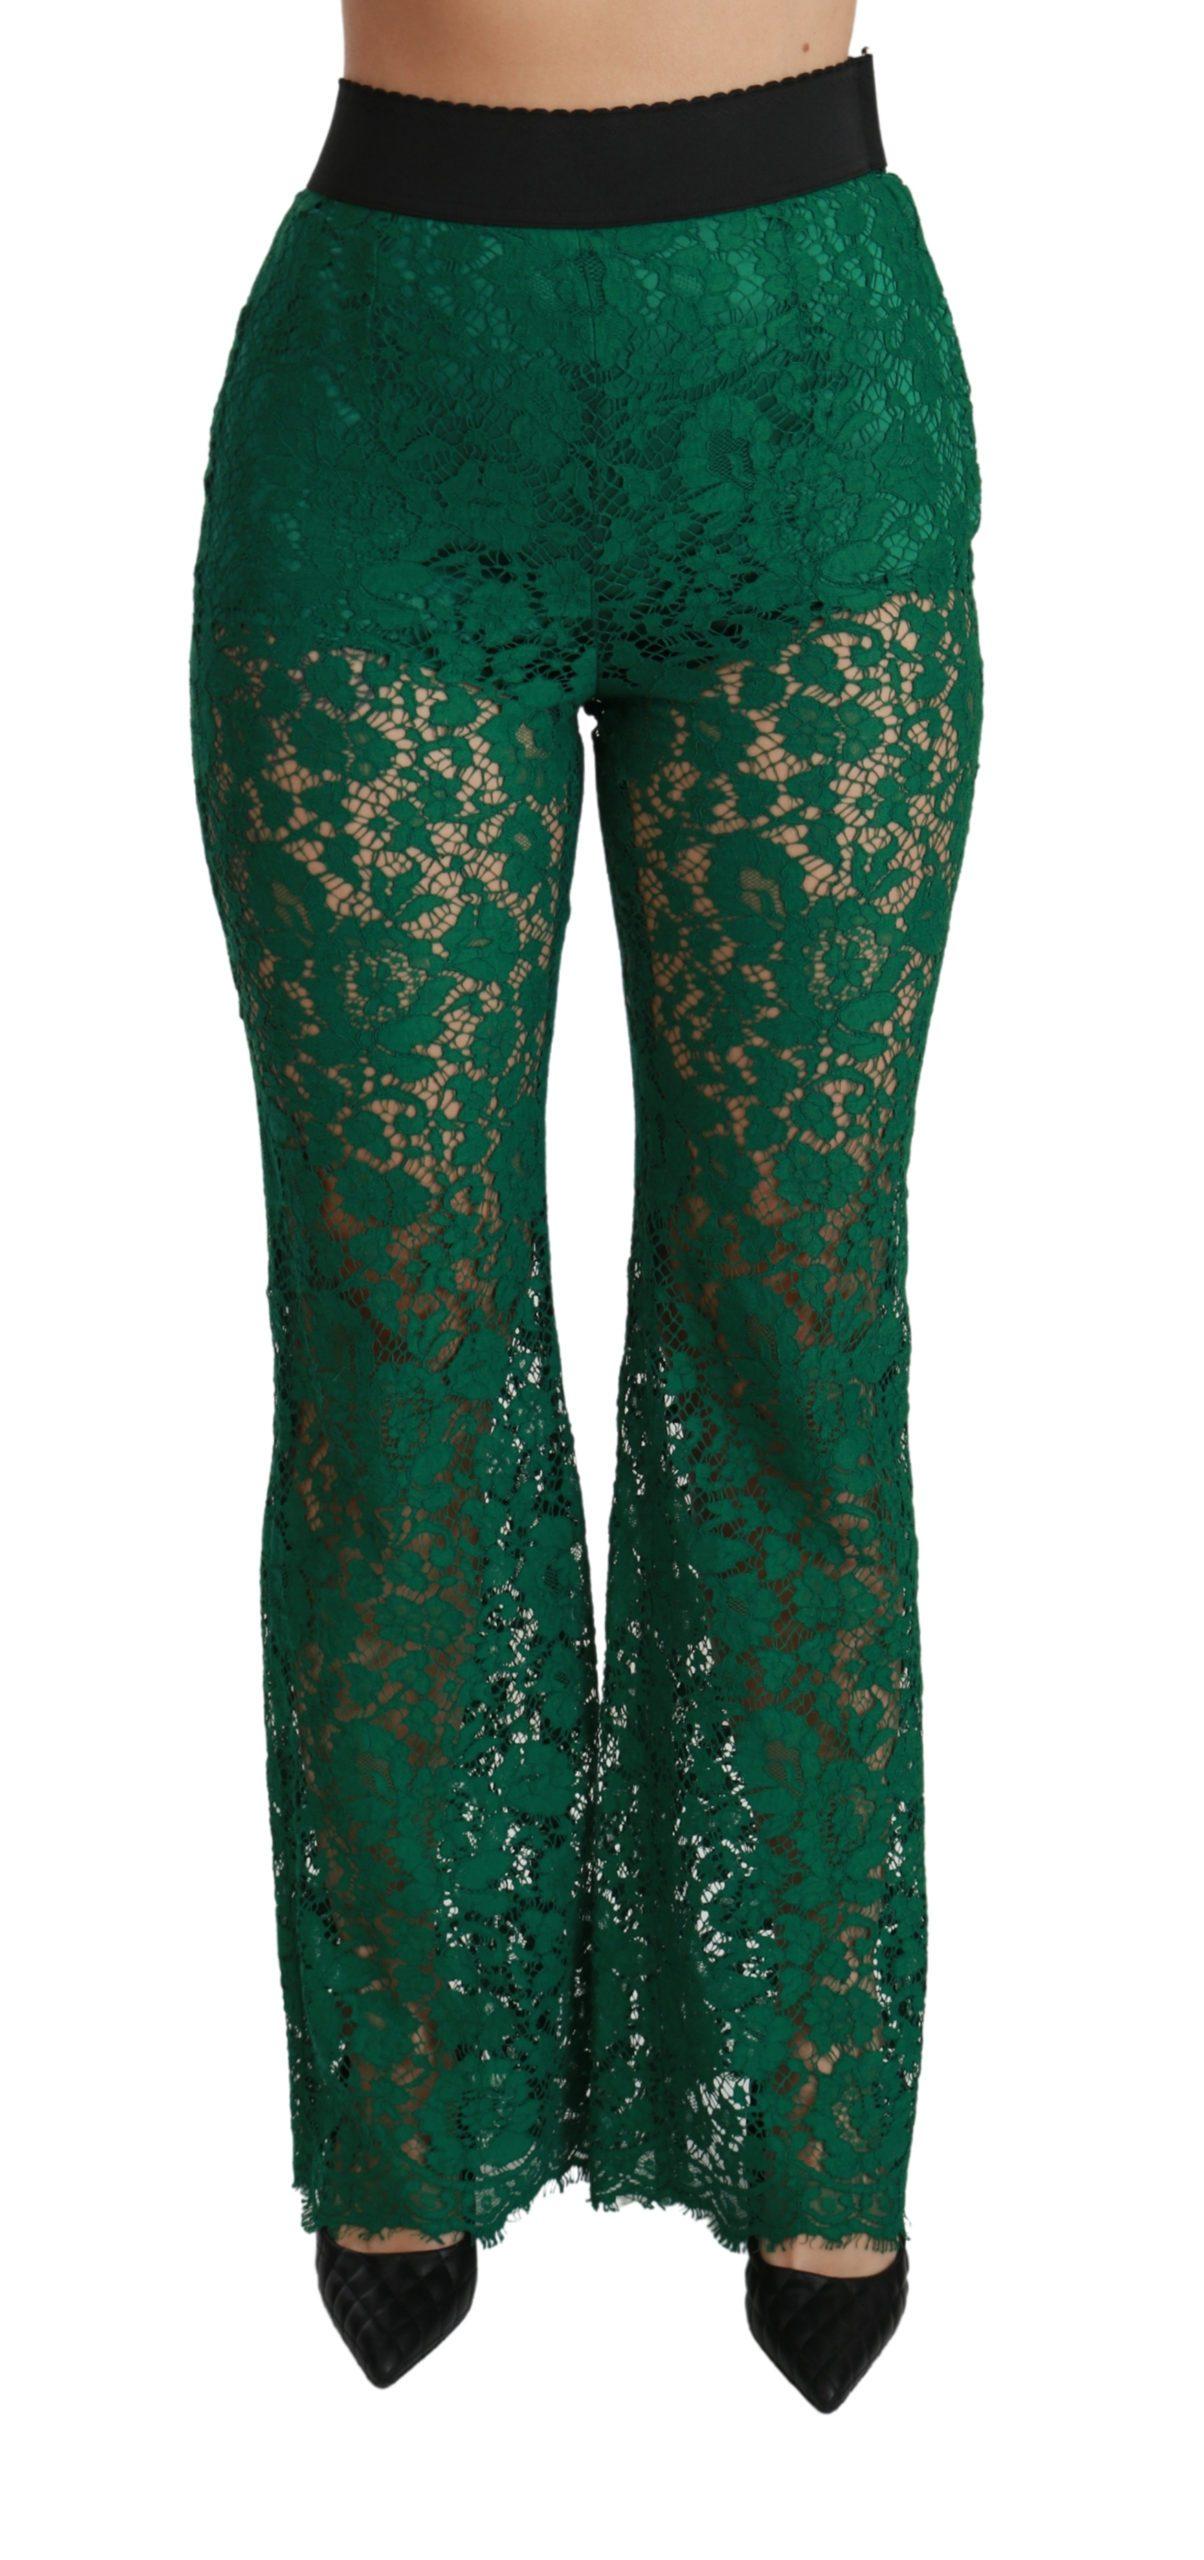 Dolce & Gabbana Women's Lace High Waist Flared Trouser Green PAN70824 - IT40 S